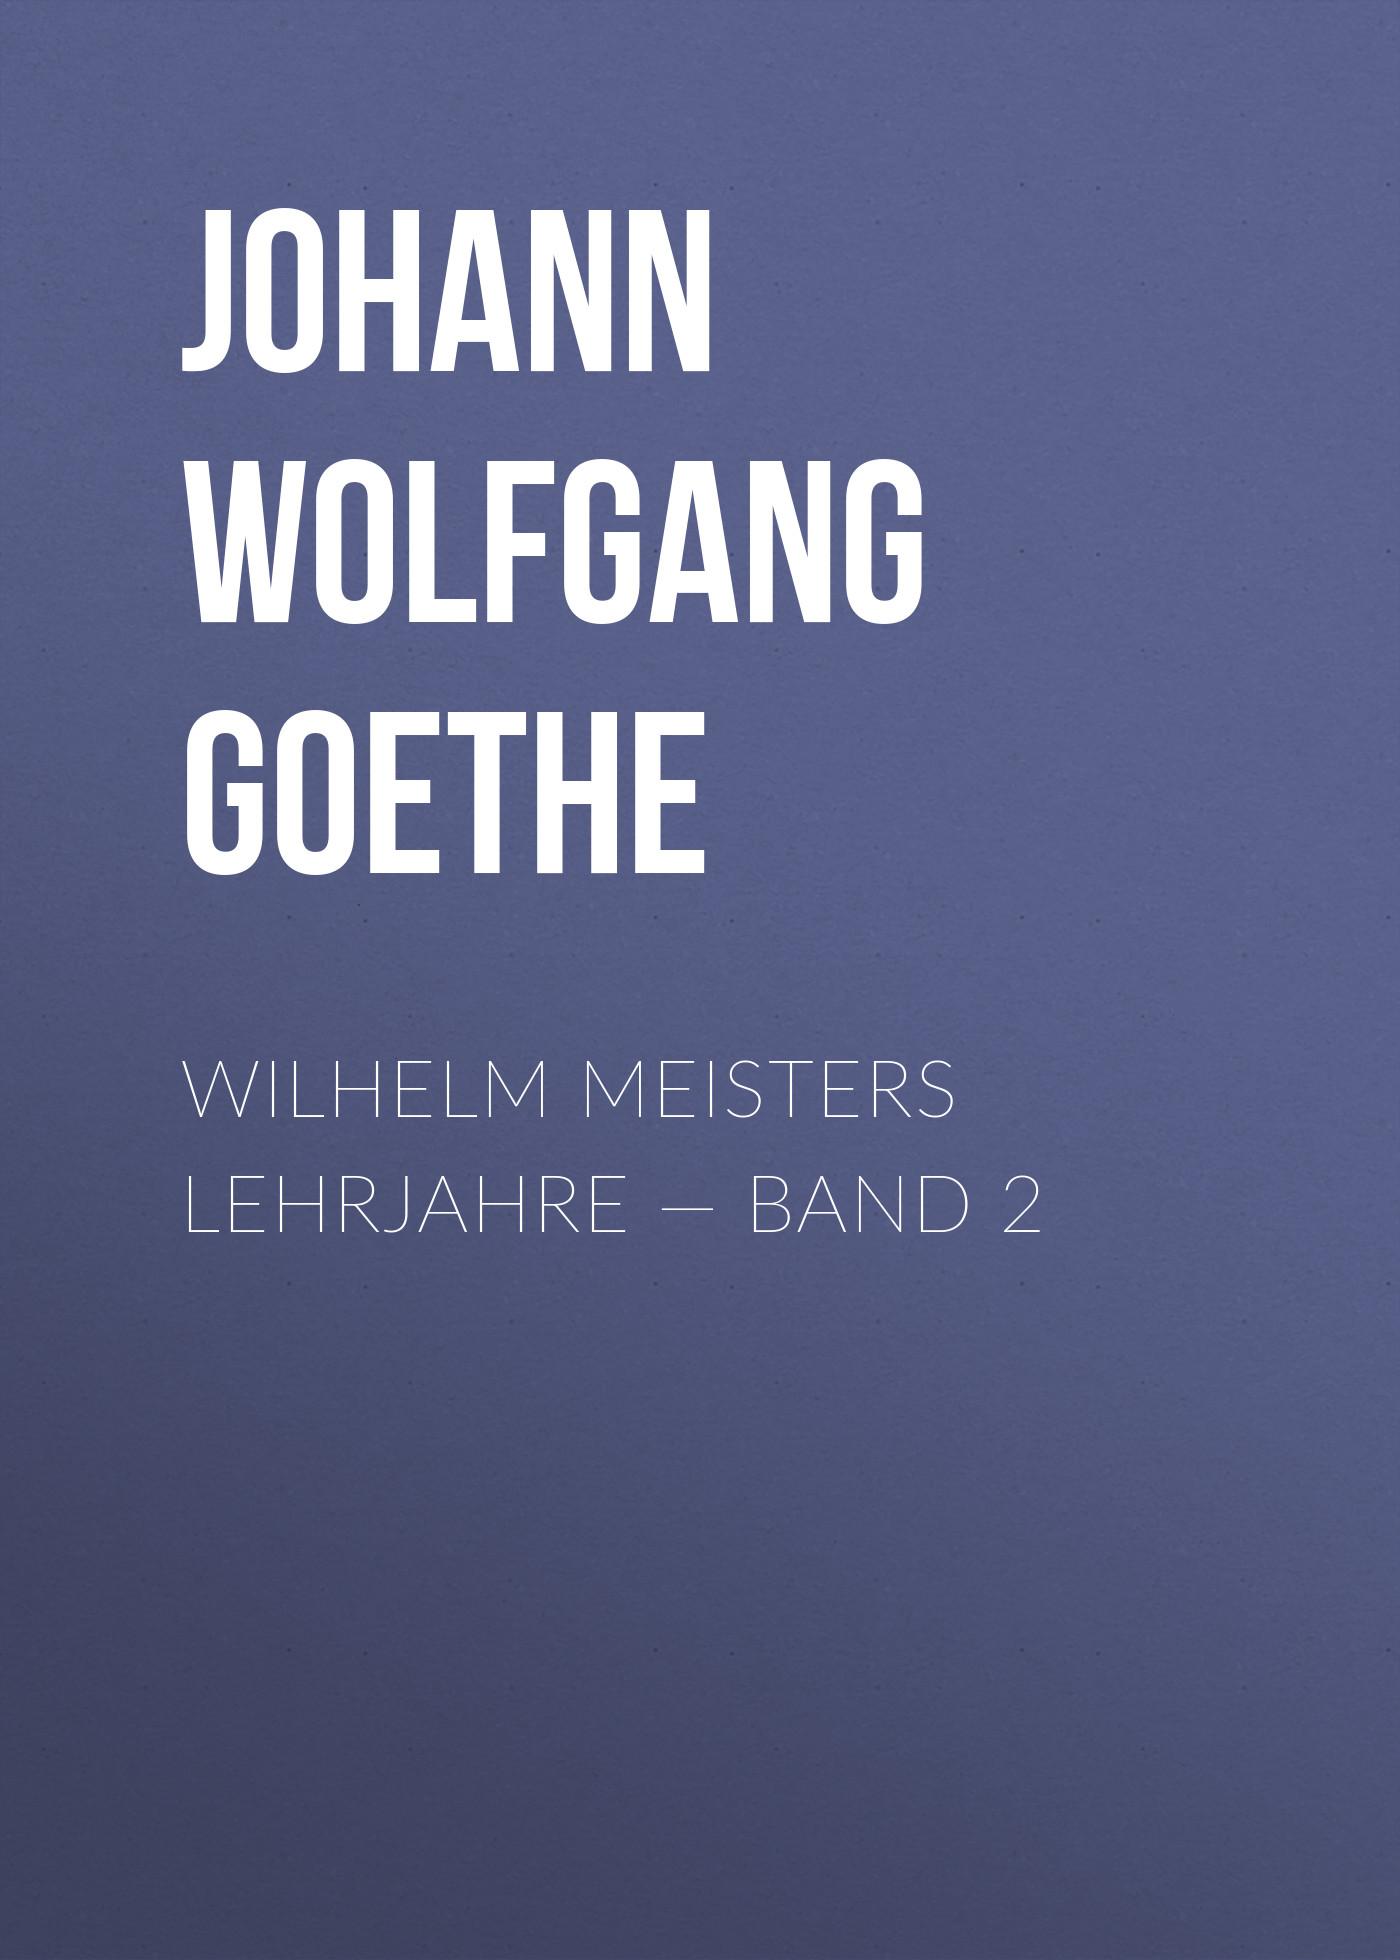 Иоганн Вольфганг фон Гёте Wilhelm Meisters Lehrjahre — Band 2